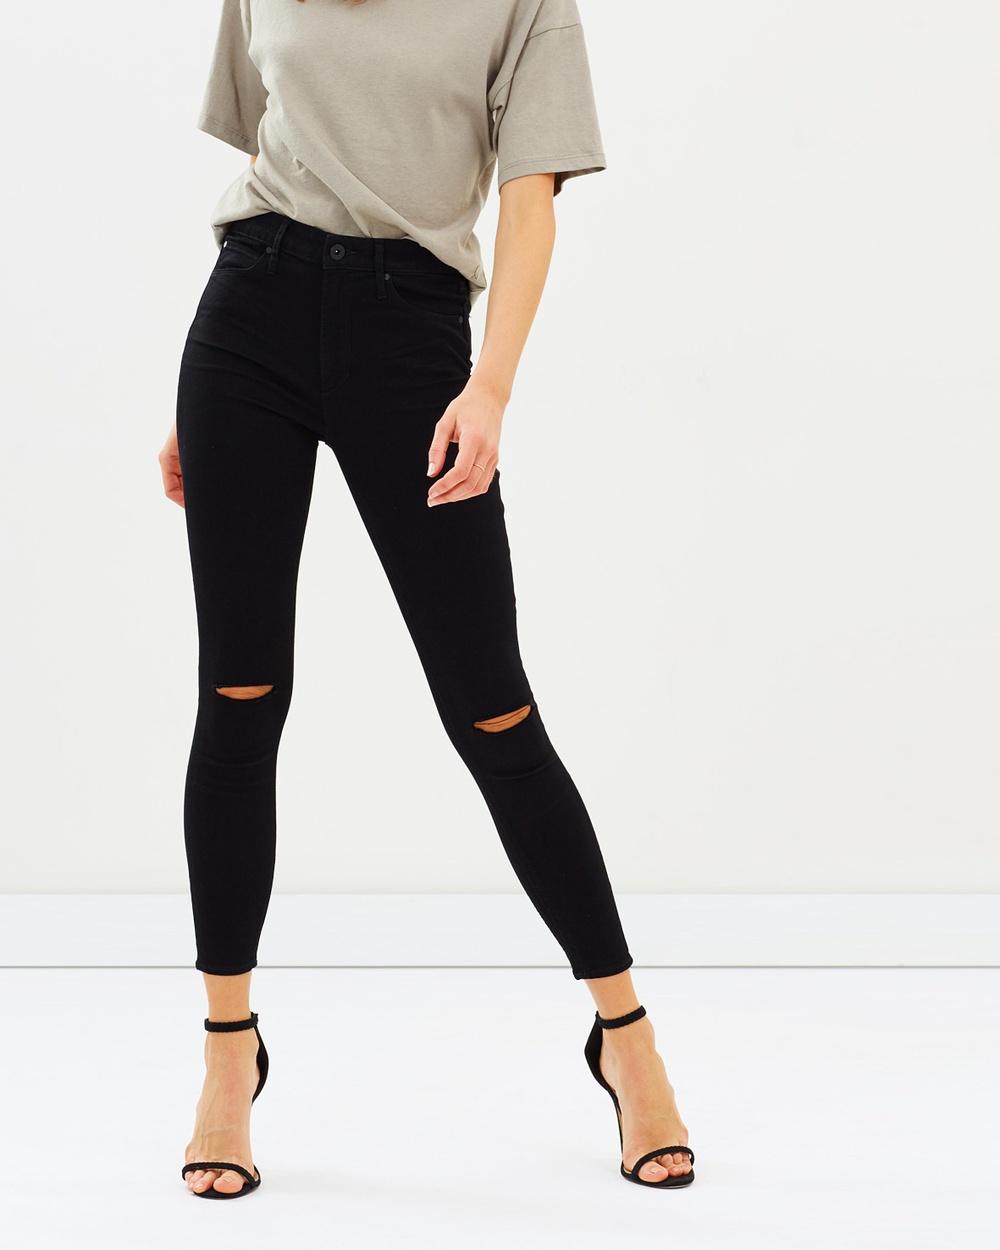 Articles of Society High Lisa Jeans High-Waisted Black Tar Australia